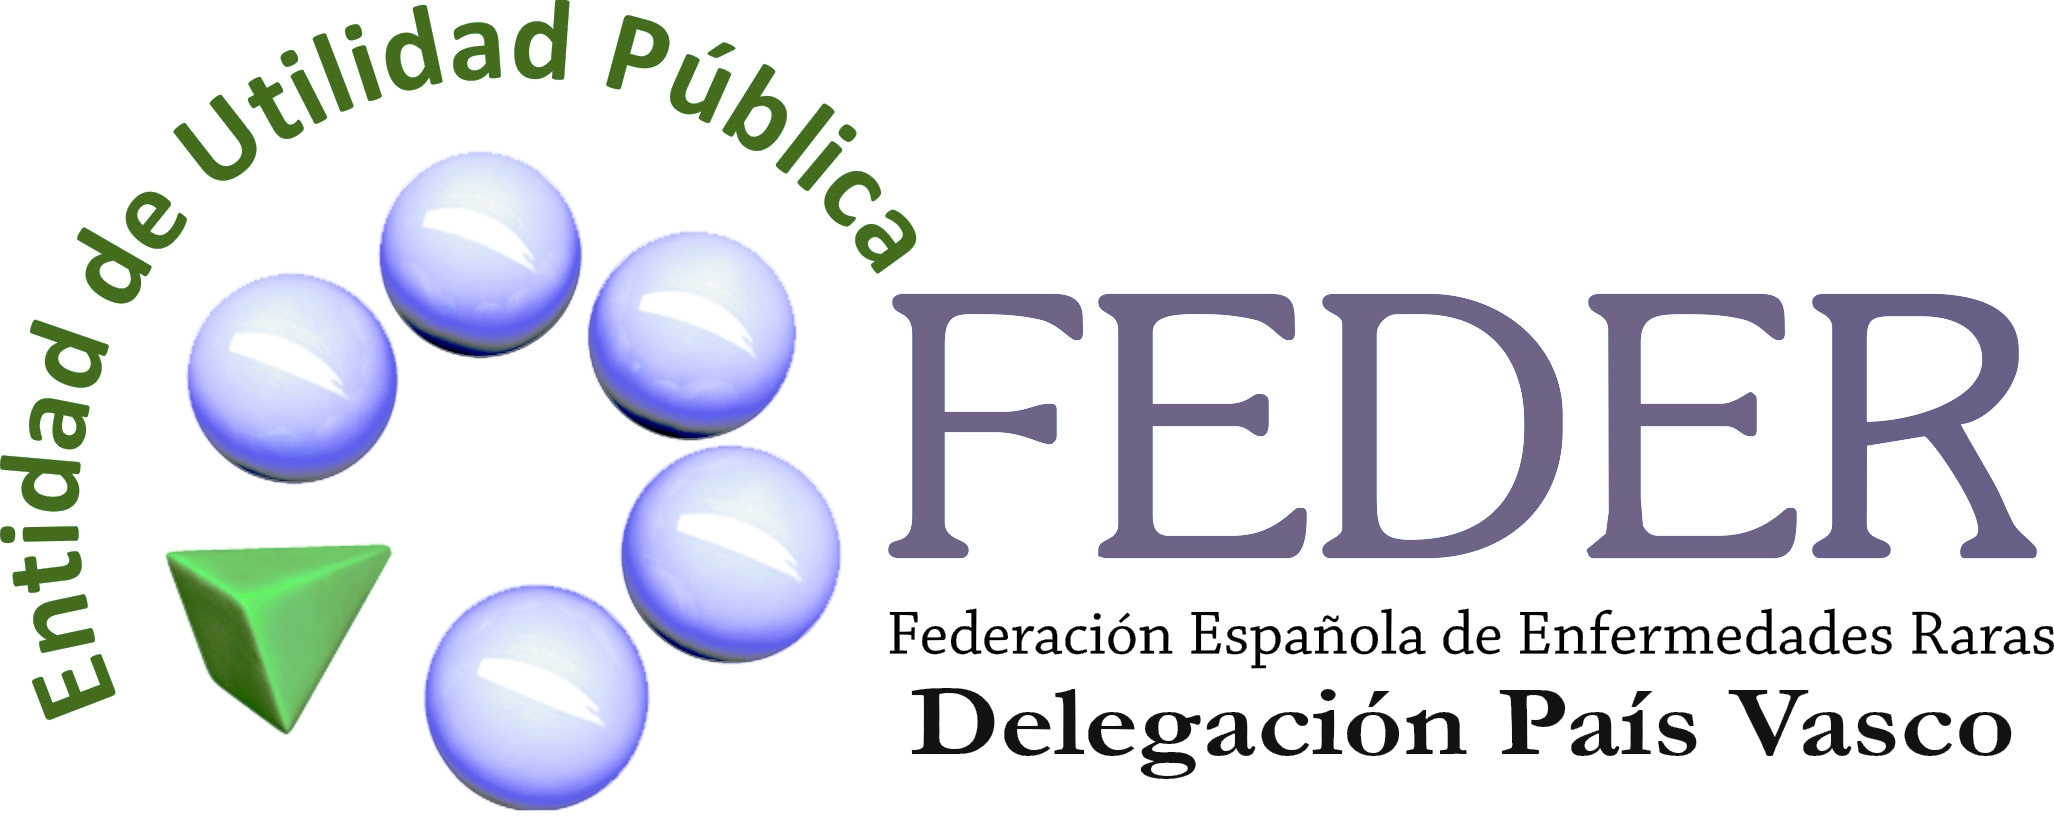 Proyecto FEDER 2013